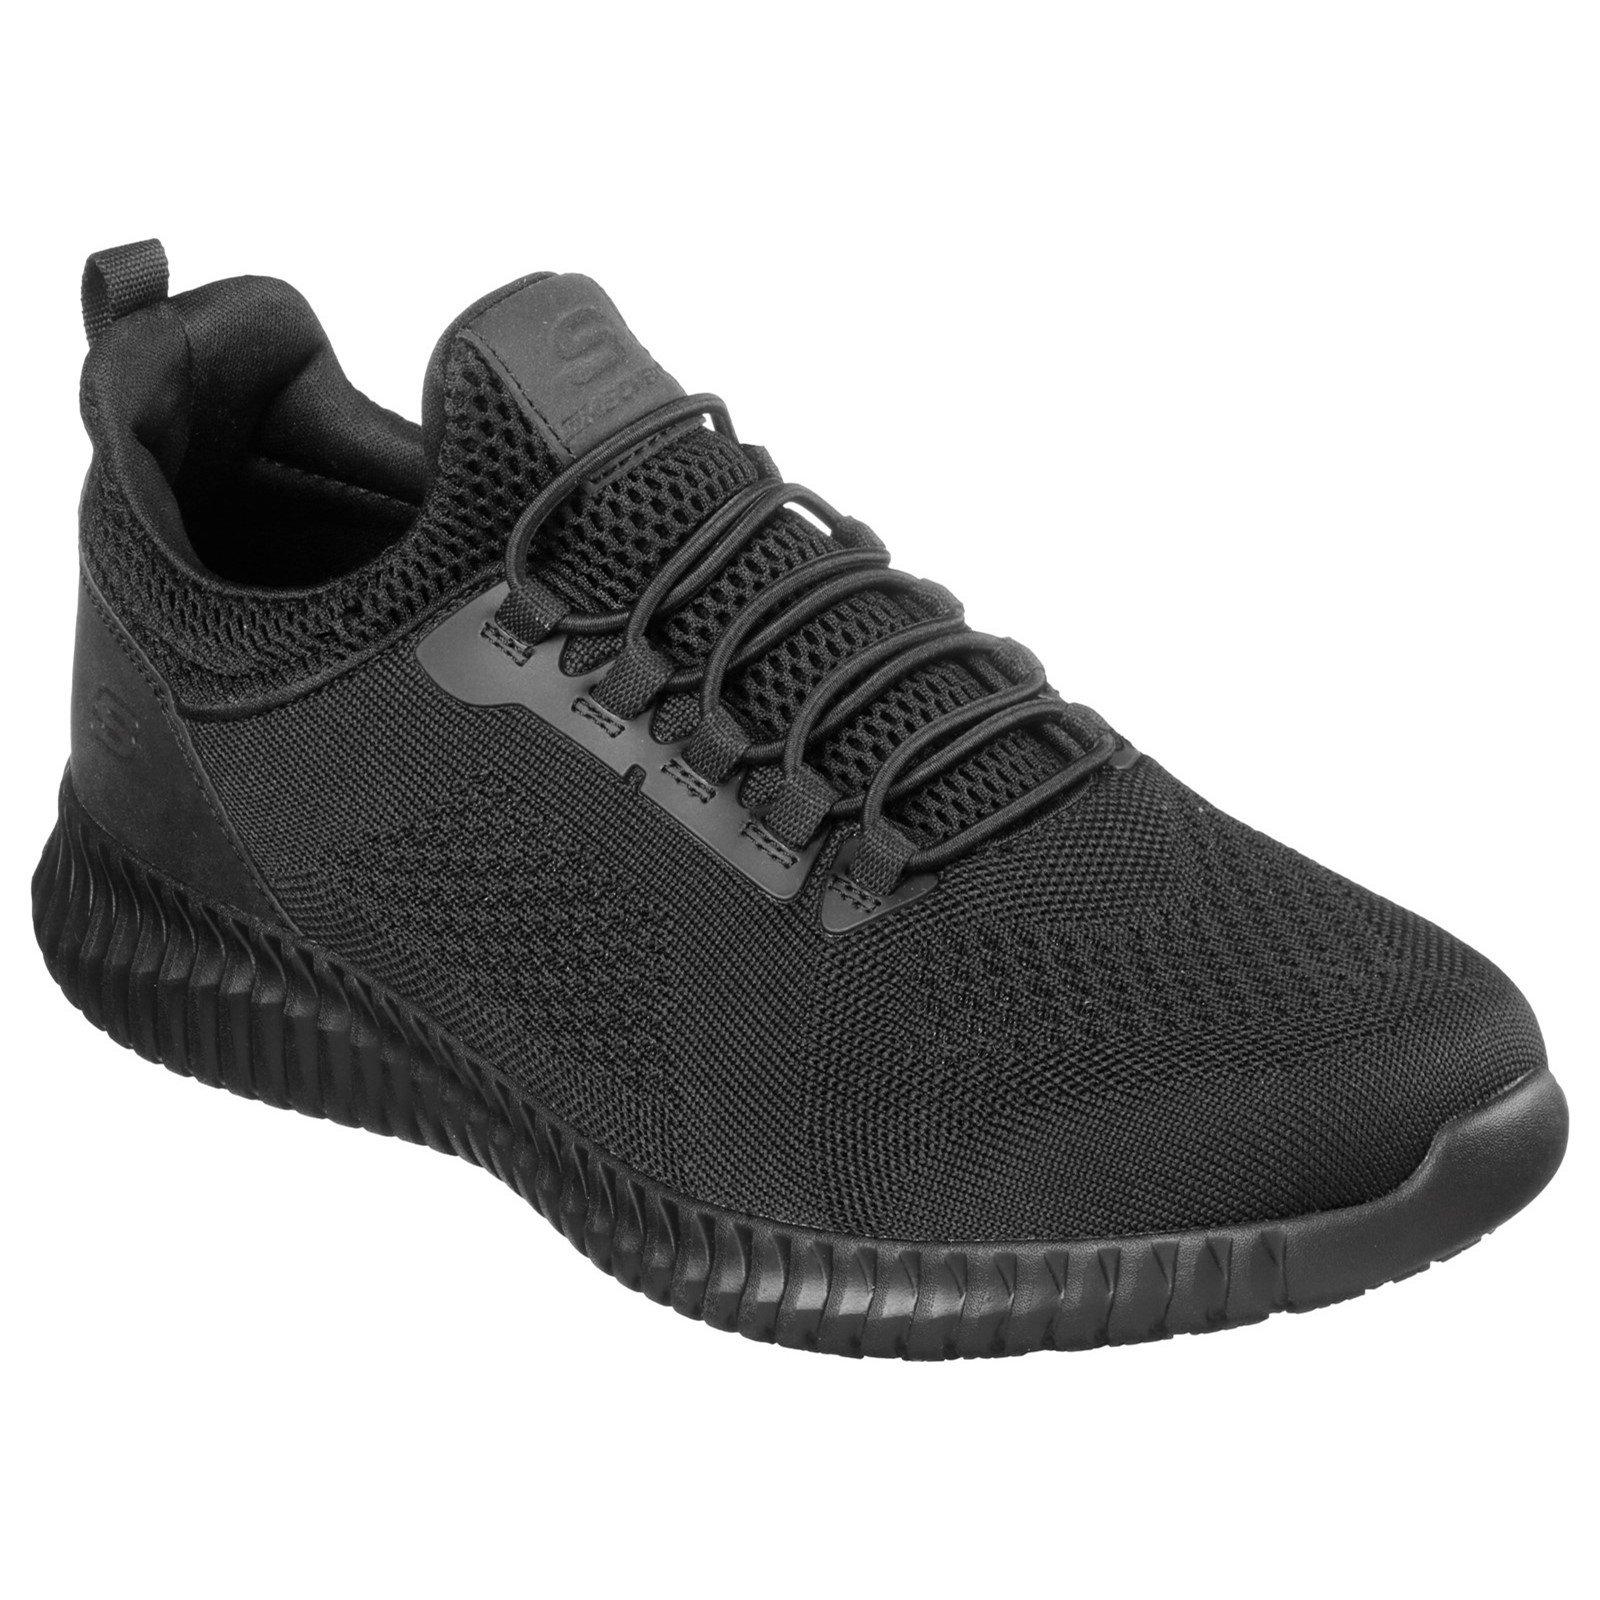 Skechers Unisex Cessnock Trainer Black 32620 - Black 7